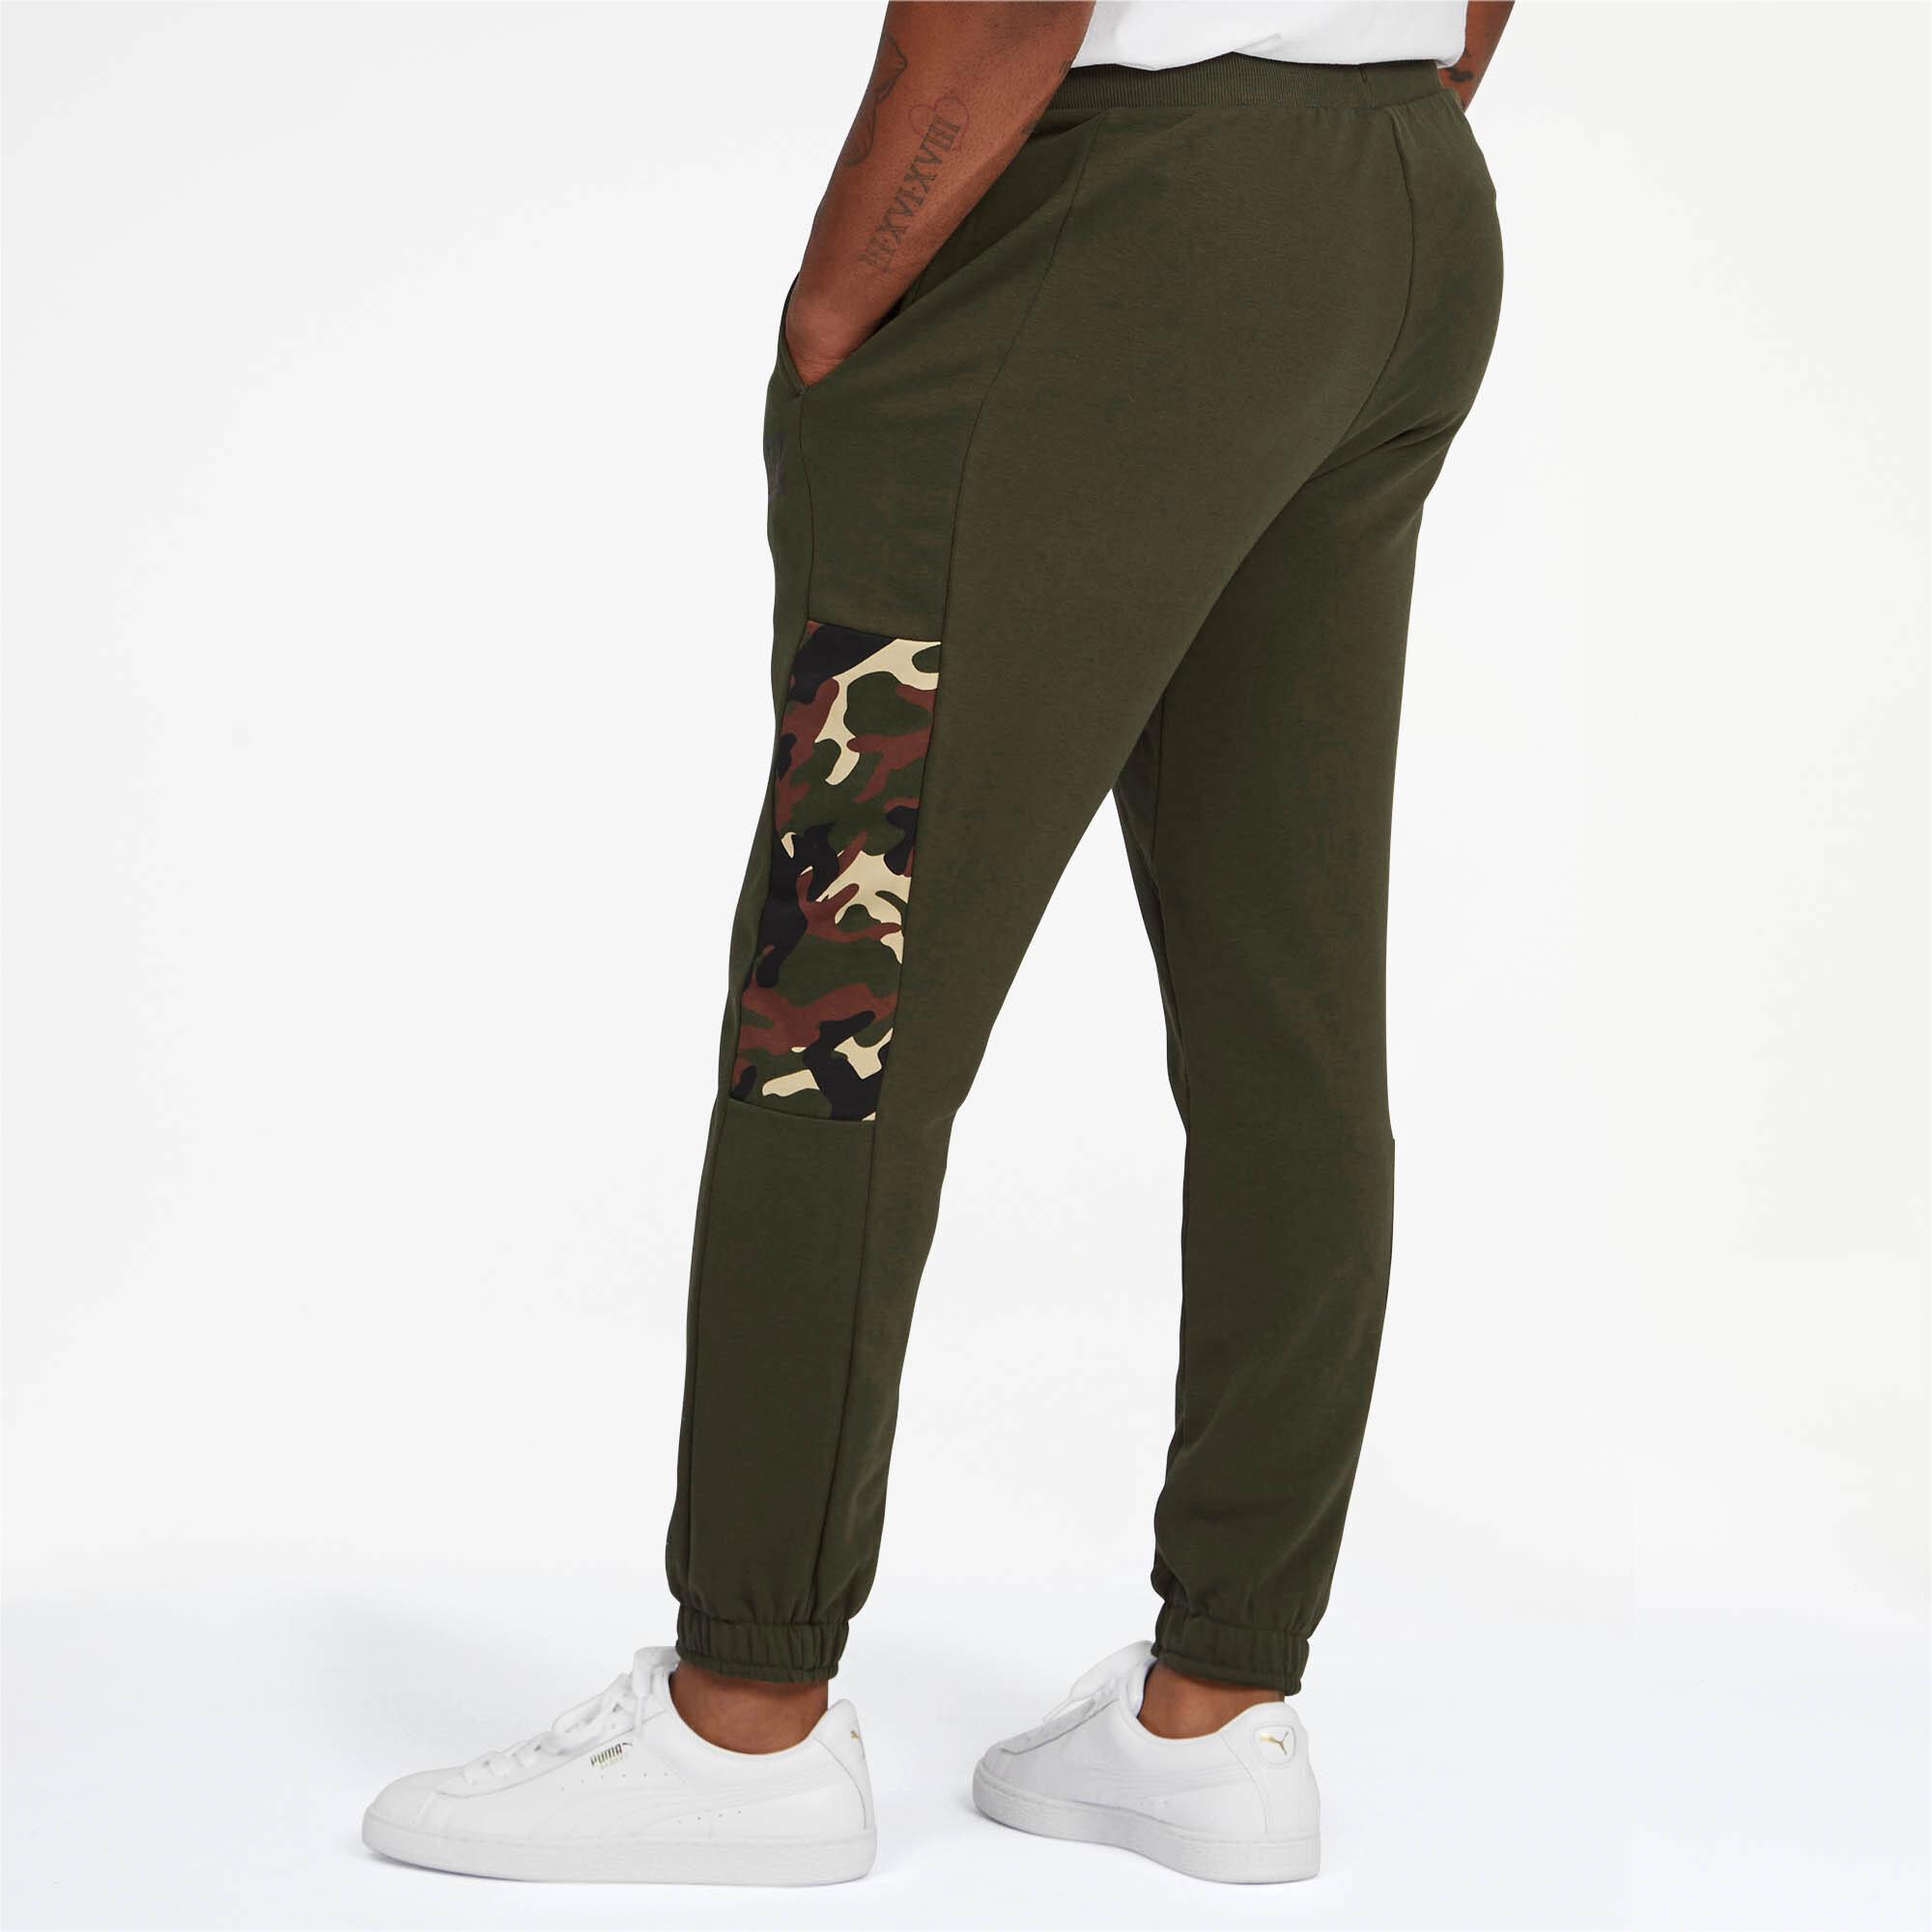 PUMA-Rebel-Camo-Men-039-s-Pants-Men-Knitted-Pants-Basics thumbnail 9